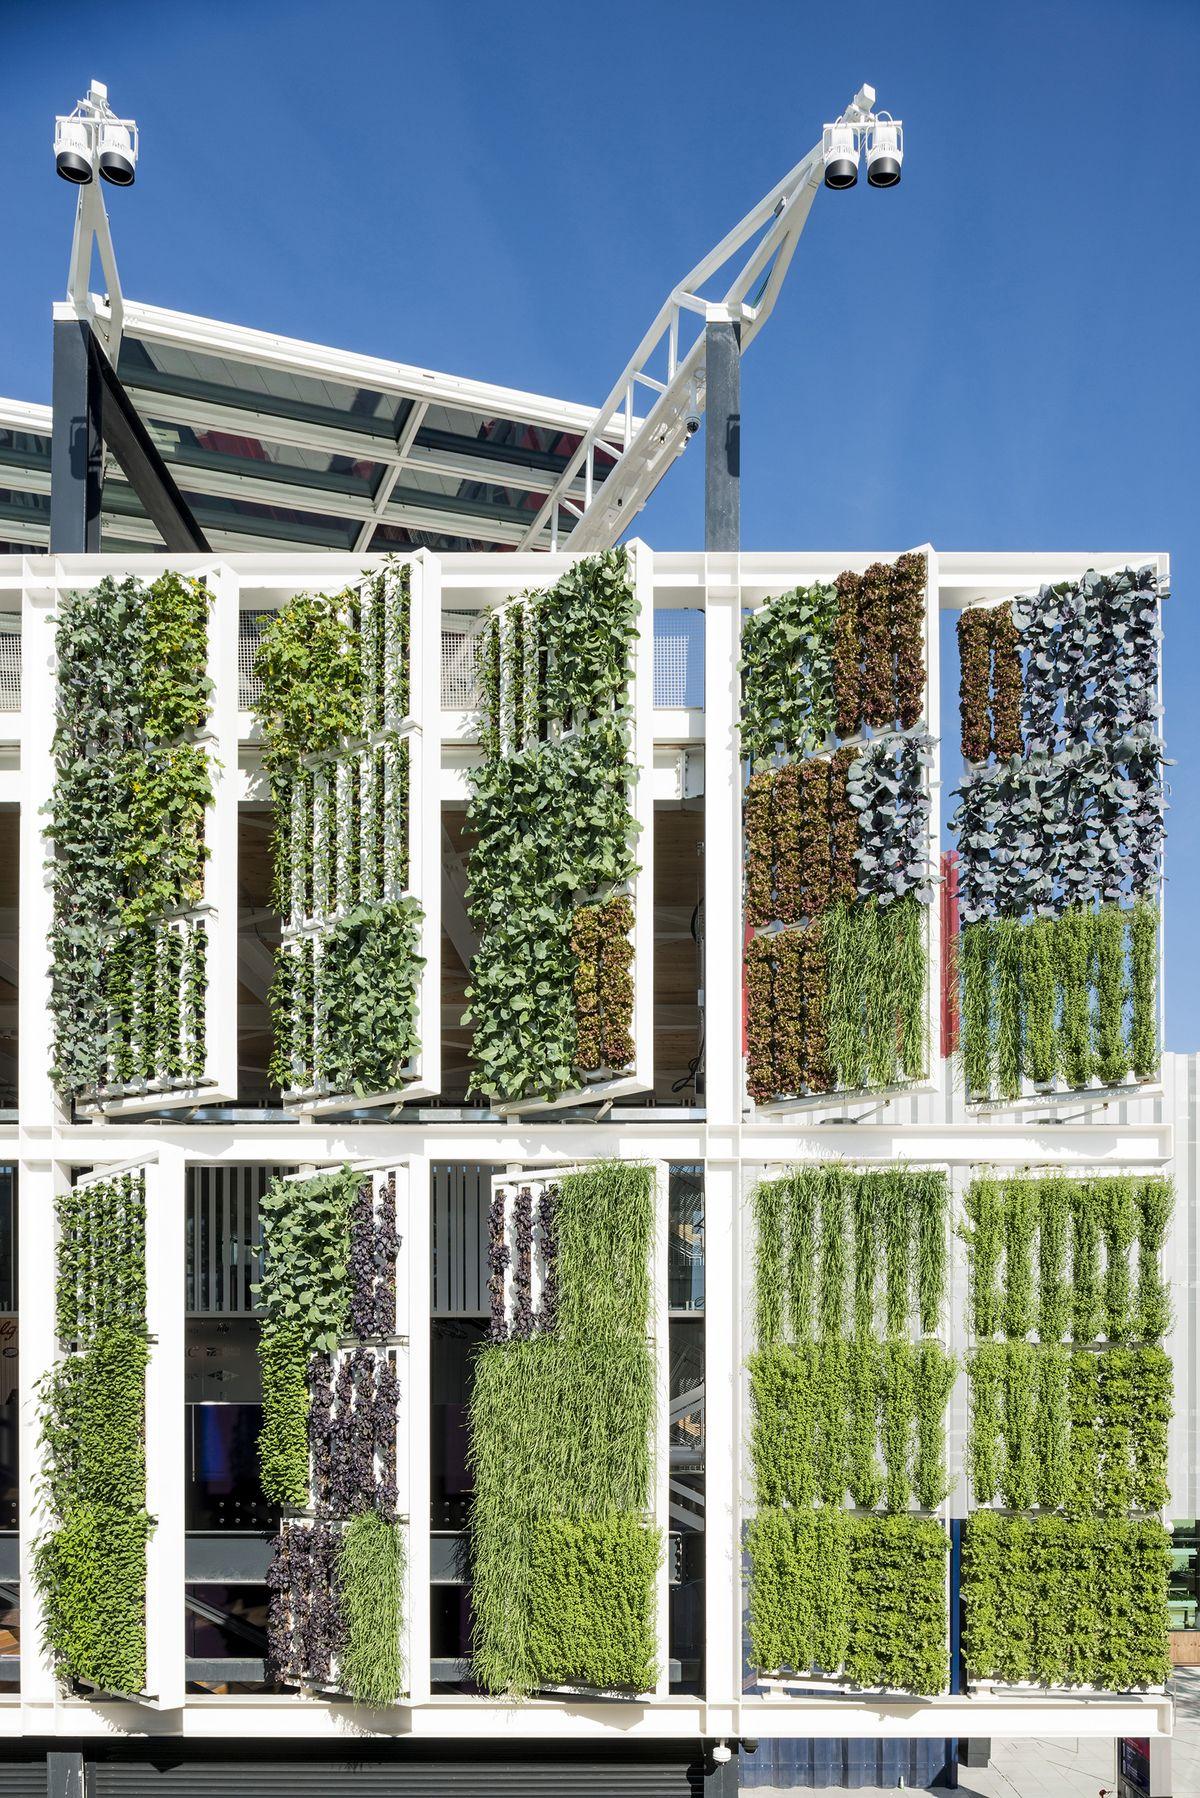 Usa pavilion expo milano 2015 green facade and wall pinterest gr ne architektur - Grune architektur ...